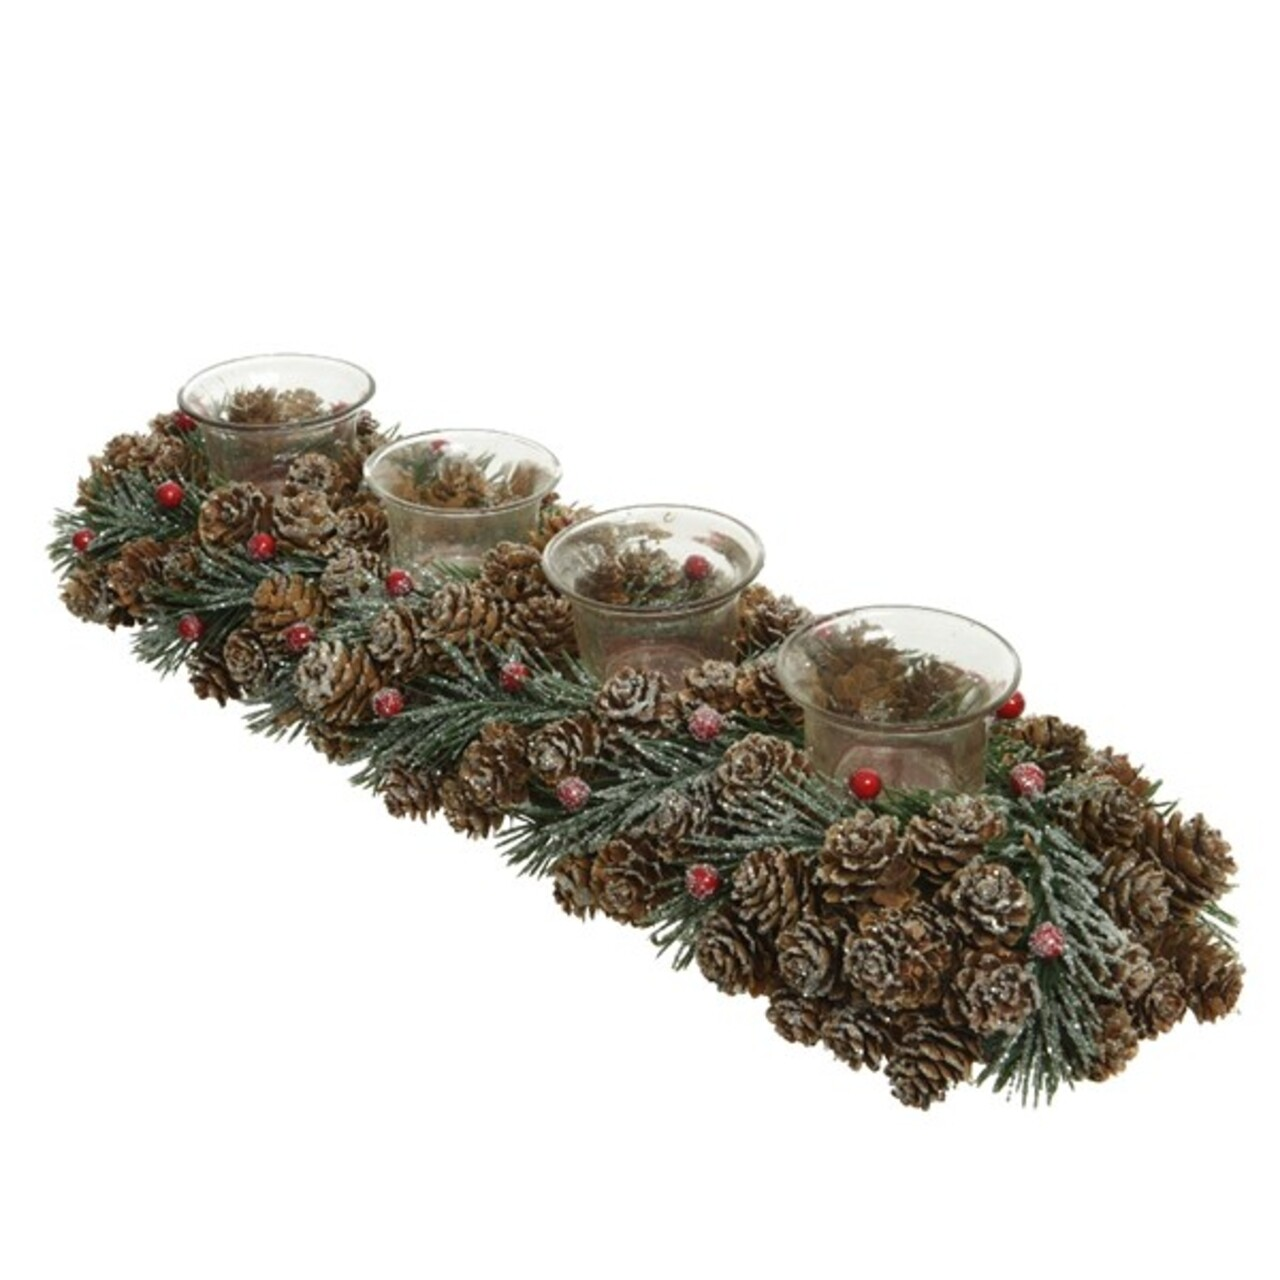 Decoratiune cu 4 suporturi pentru lumanari Pinecone w berries, Decoris, 13x47x9 cm,verde/maro/rosu